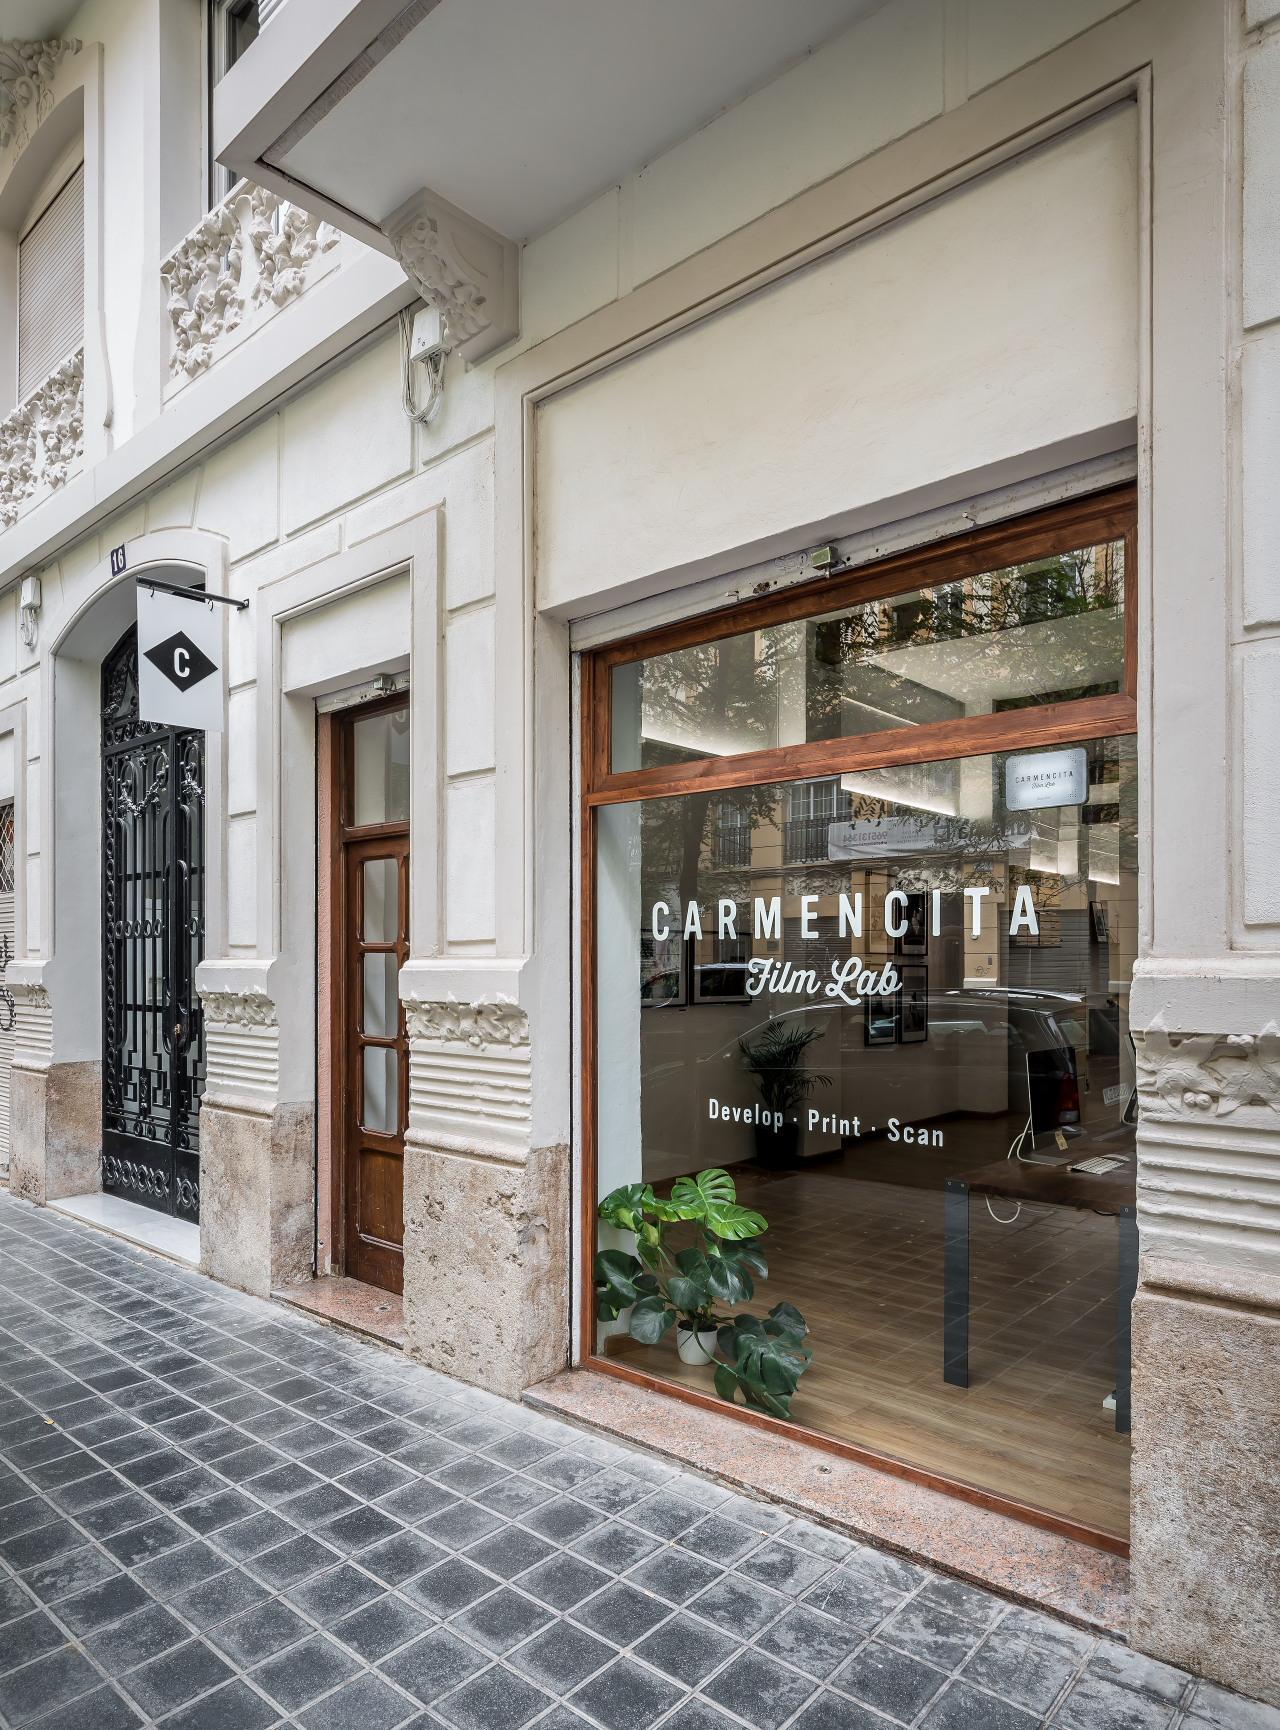 fotografia-arquitectura-interiorismo-valencia-german-cabo-boubau-carmencita-carmencitafilmlab (2)